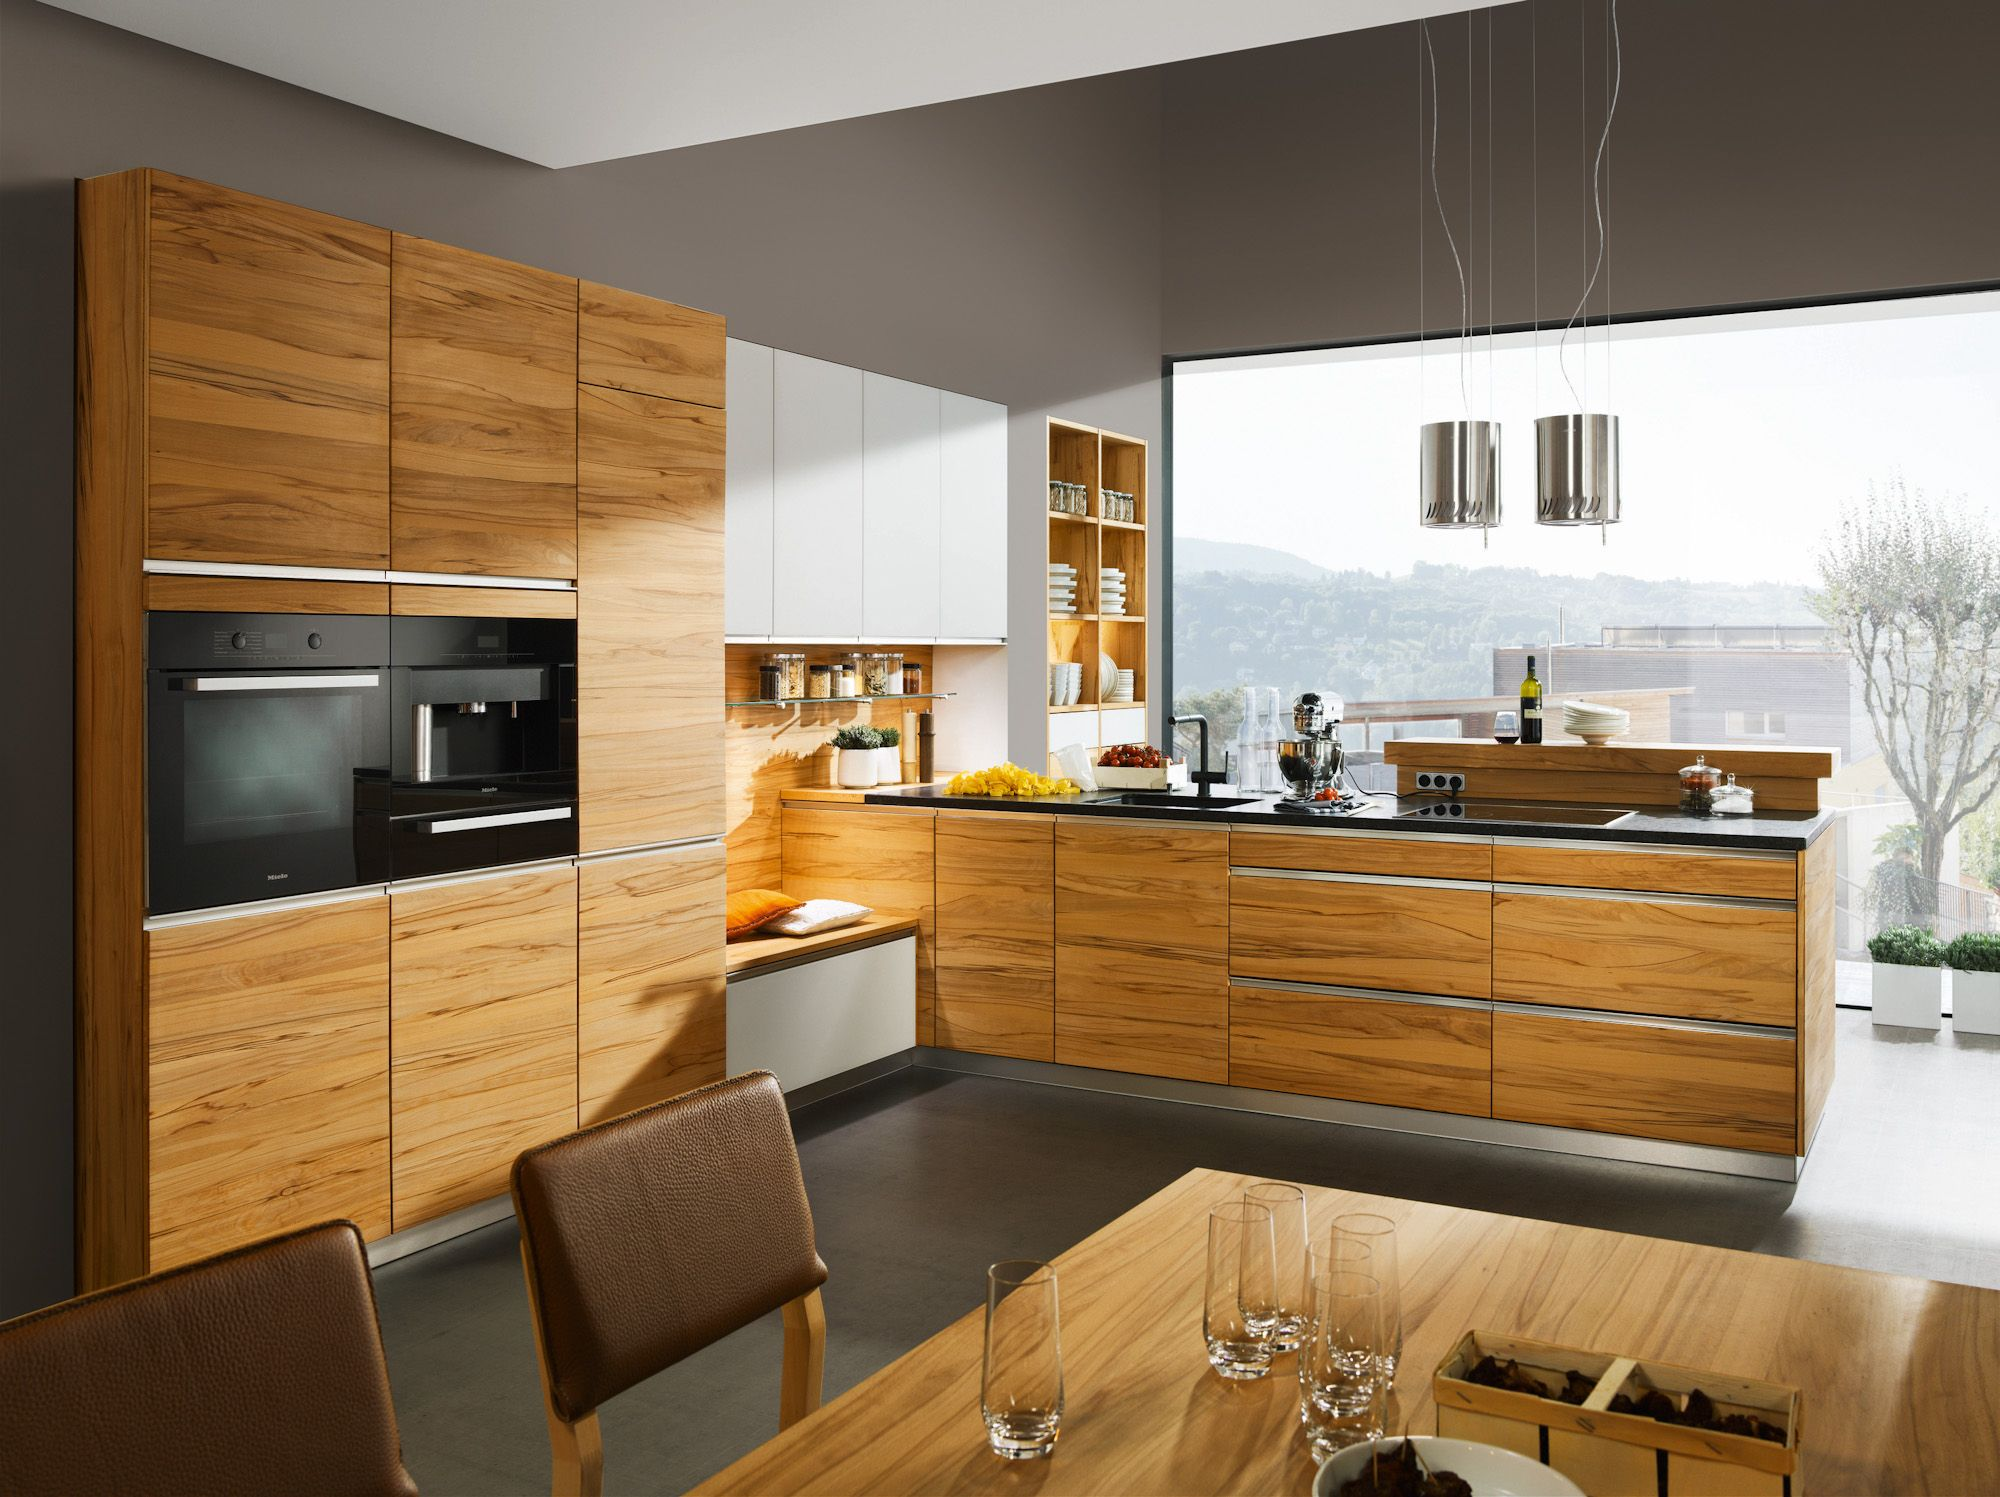 Küche  Kernbuche massiv  geölt  modern  Wohnküche  grifflos